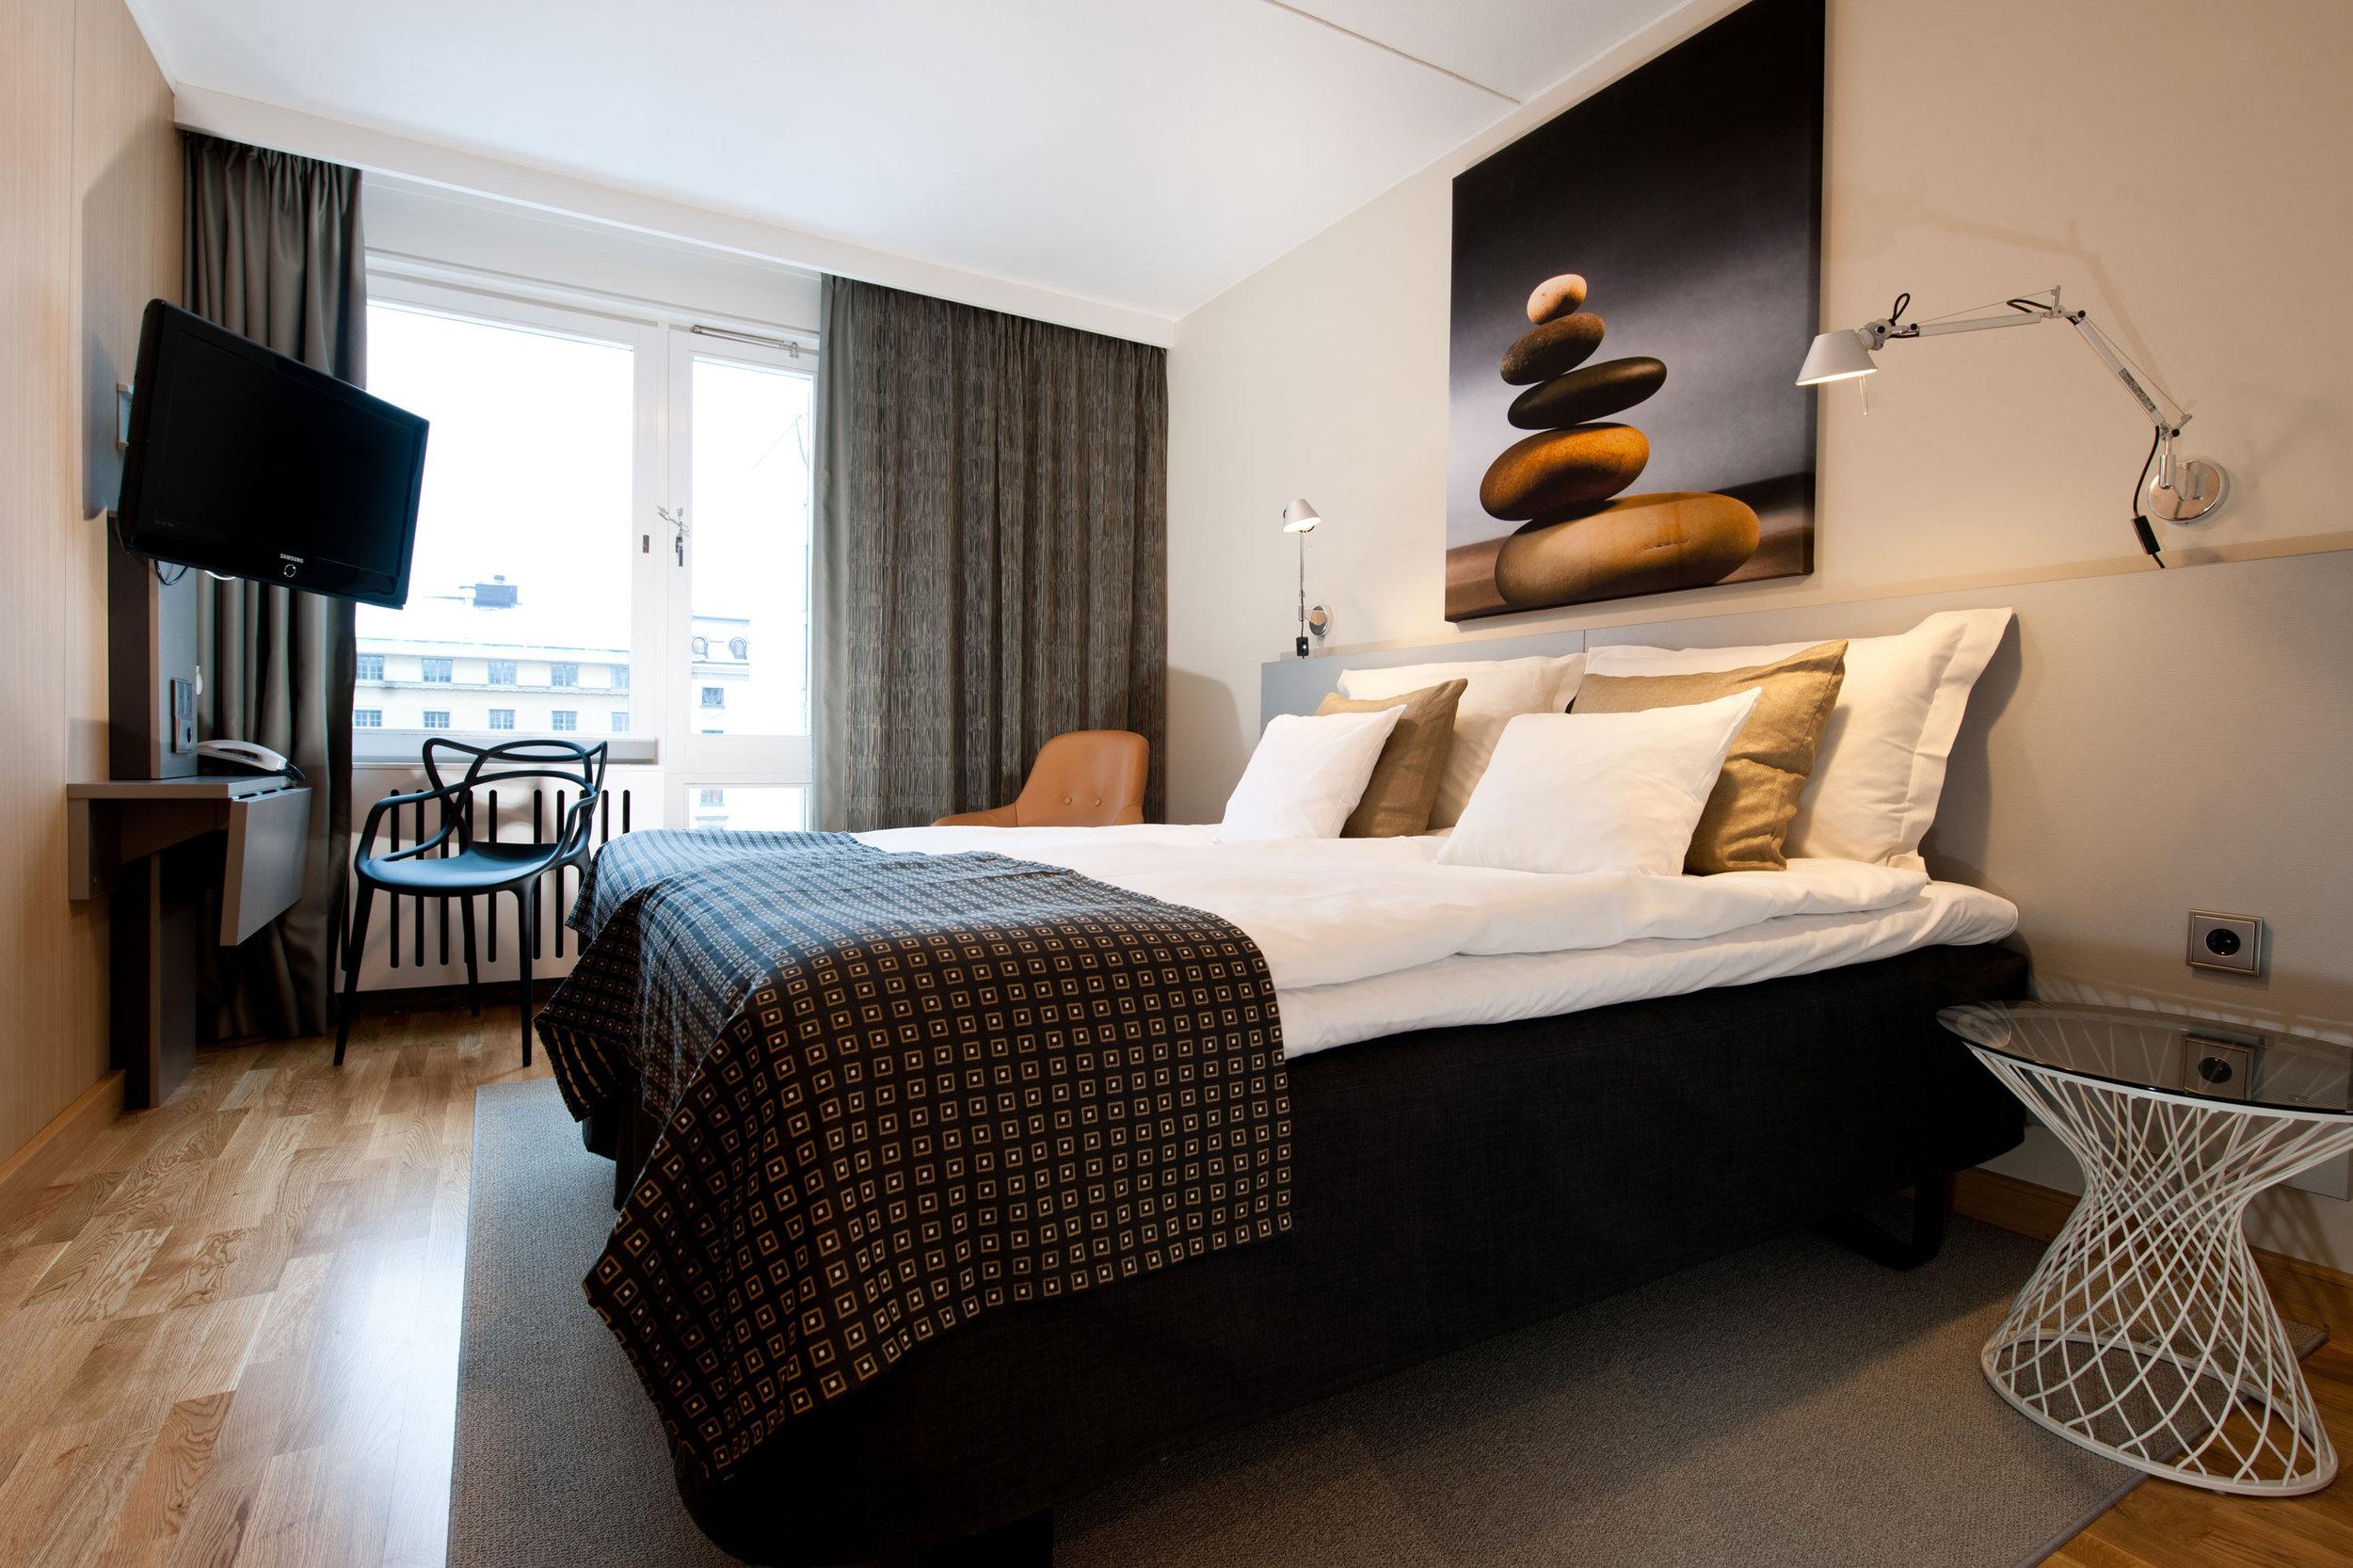 HotelBirgerJarl_Dubbelrum.jpg